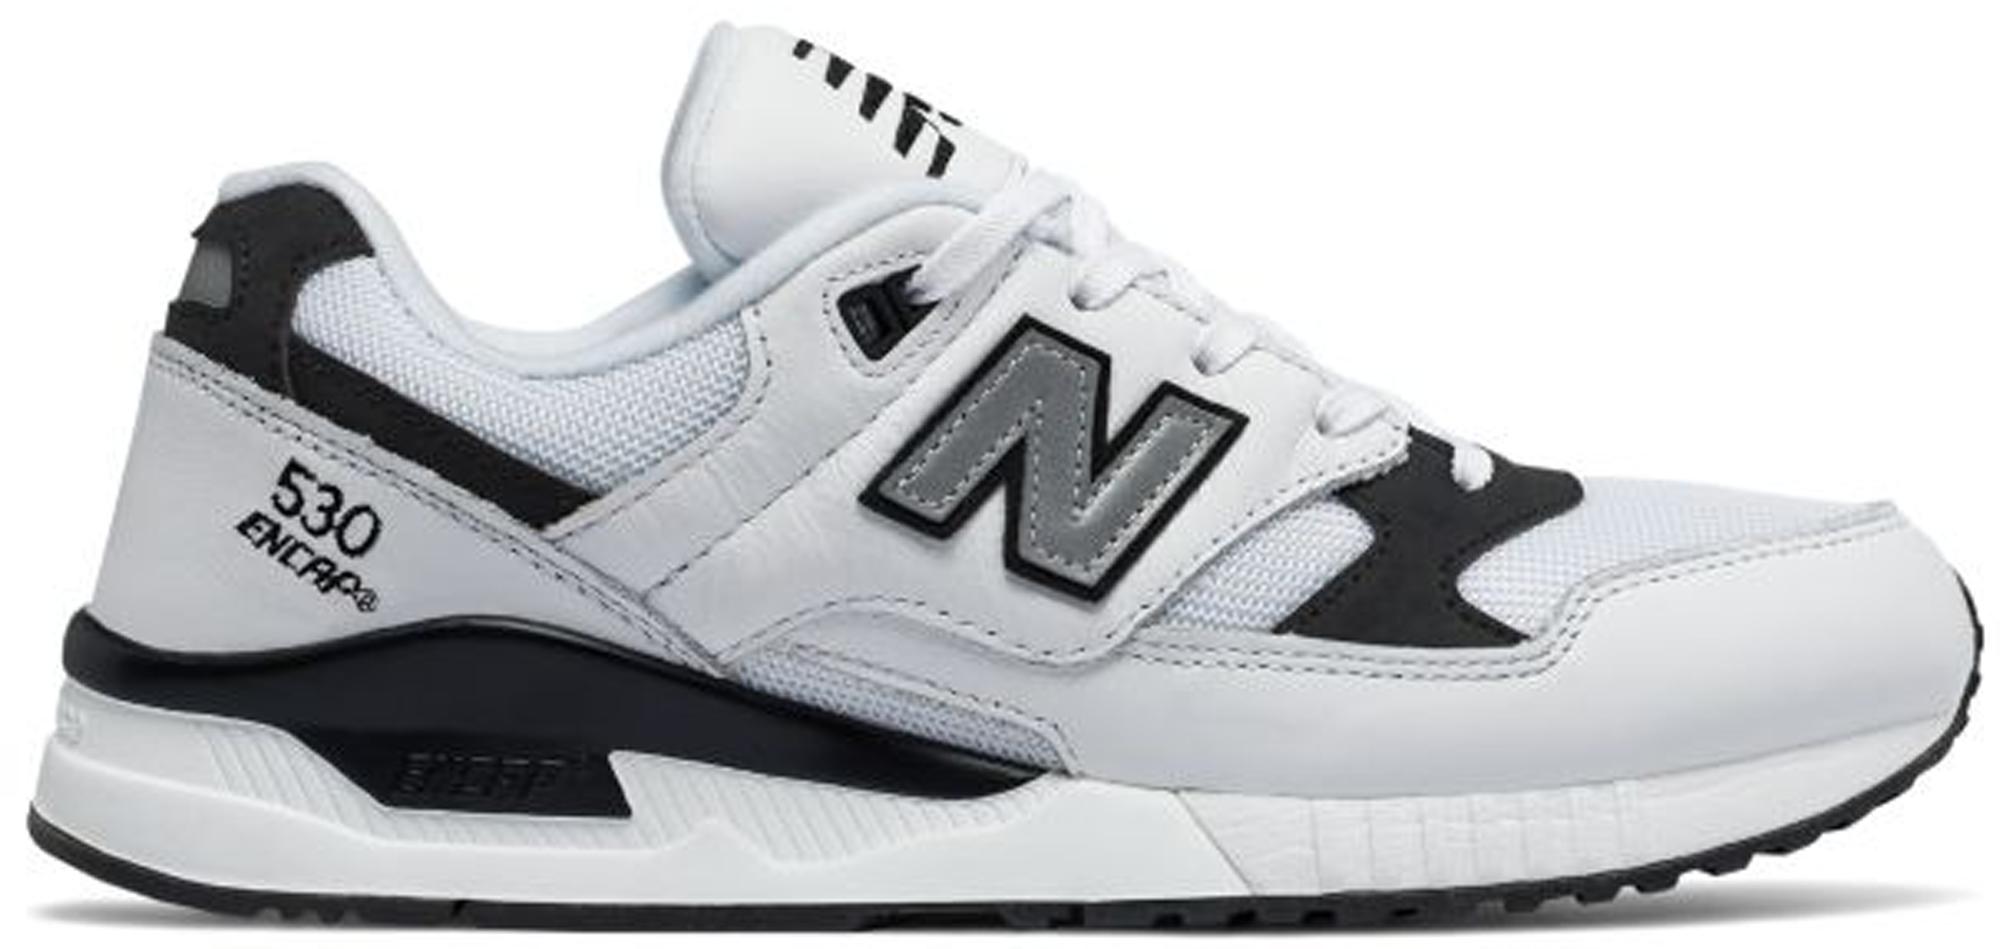 new balance 530 encap white